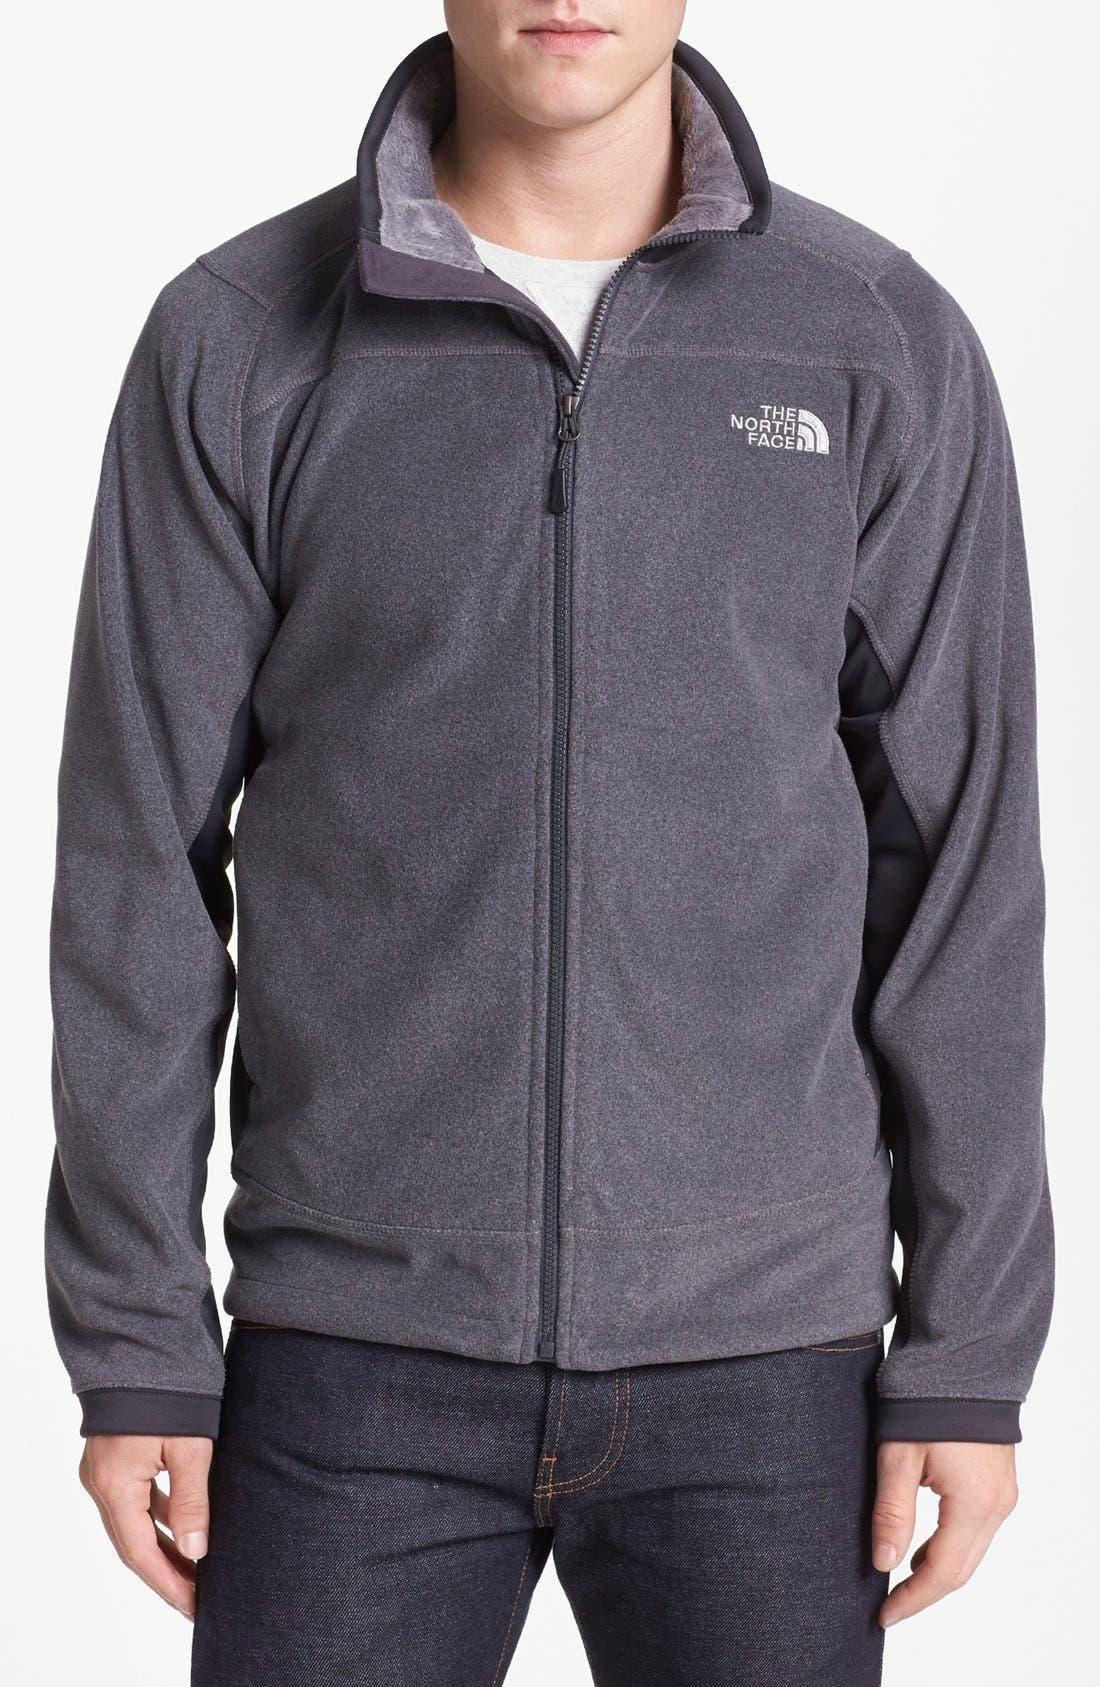 Main Image - The North Face 'Valence' FlashDry™ Fleece Jacket